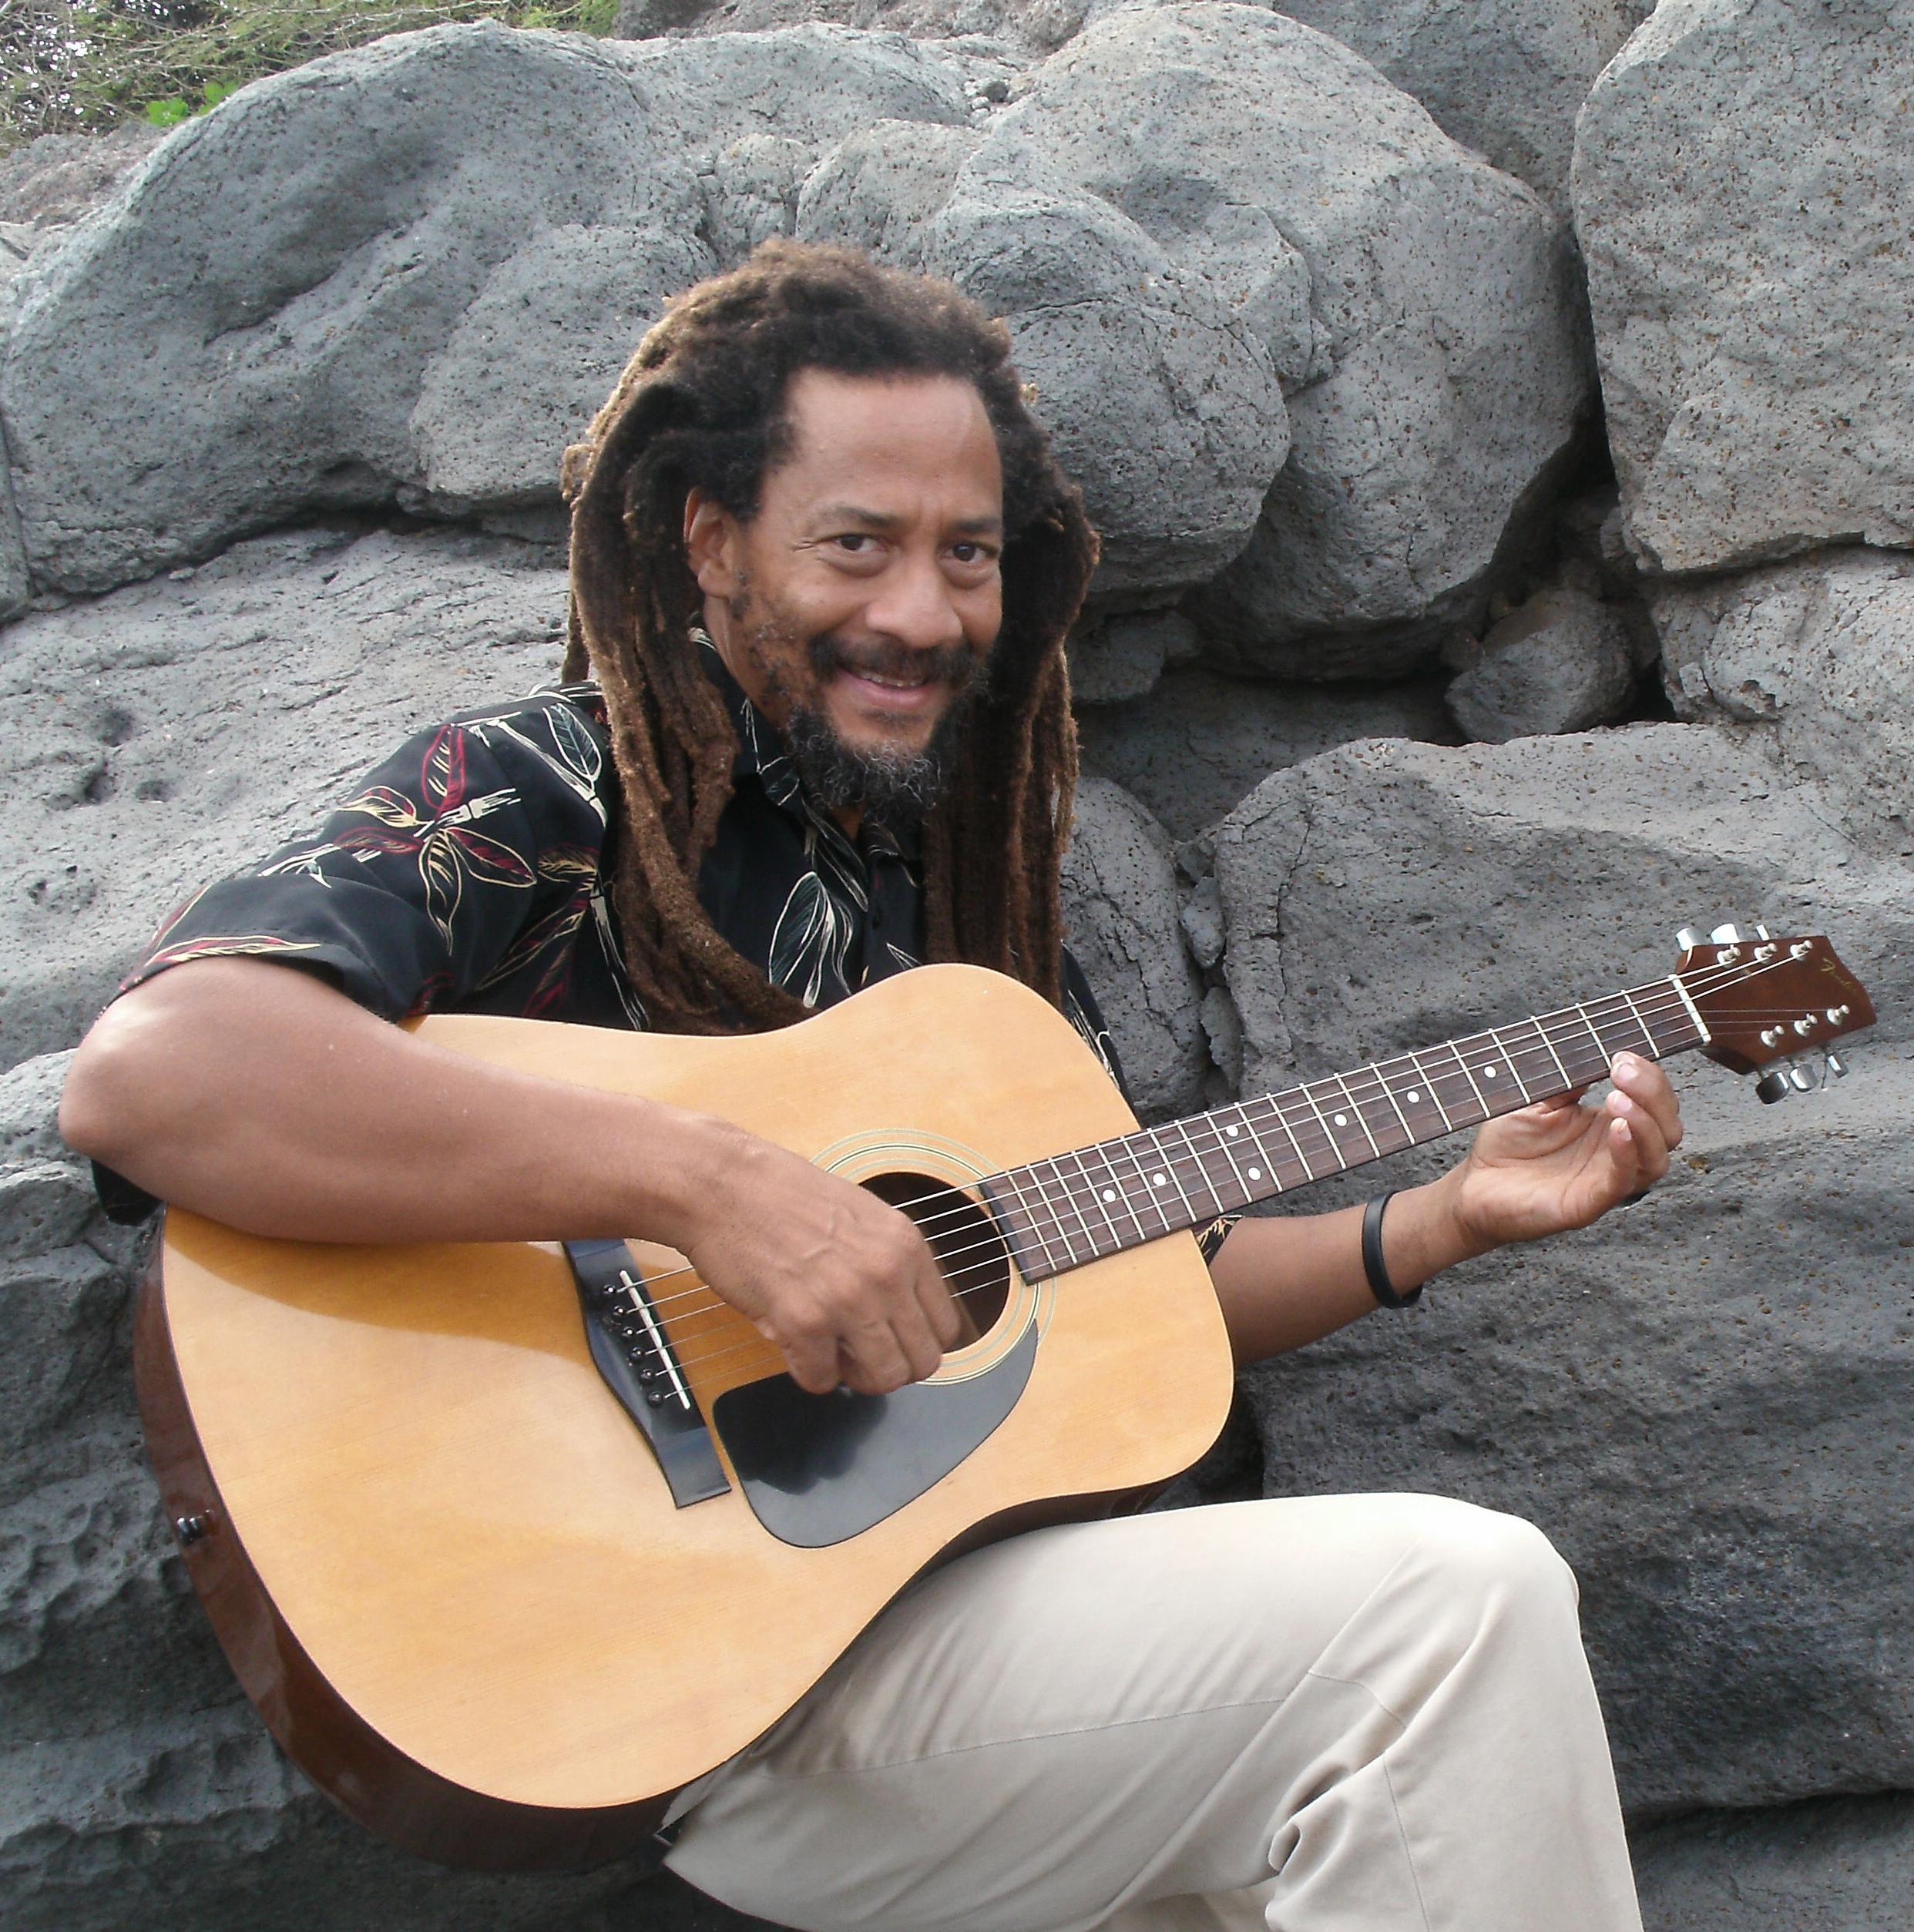 Ras Shaggai Rises from Hawaii